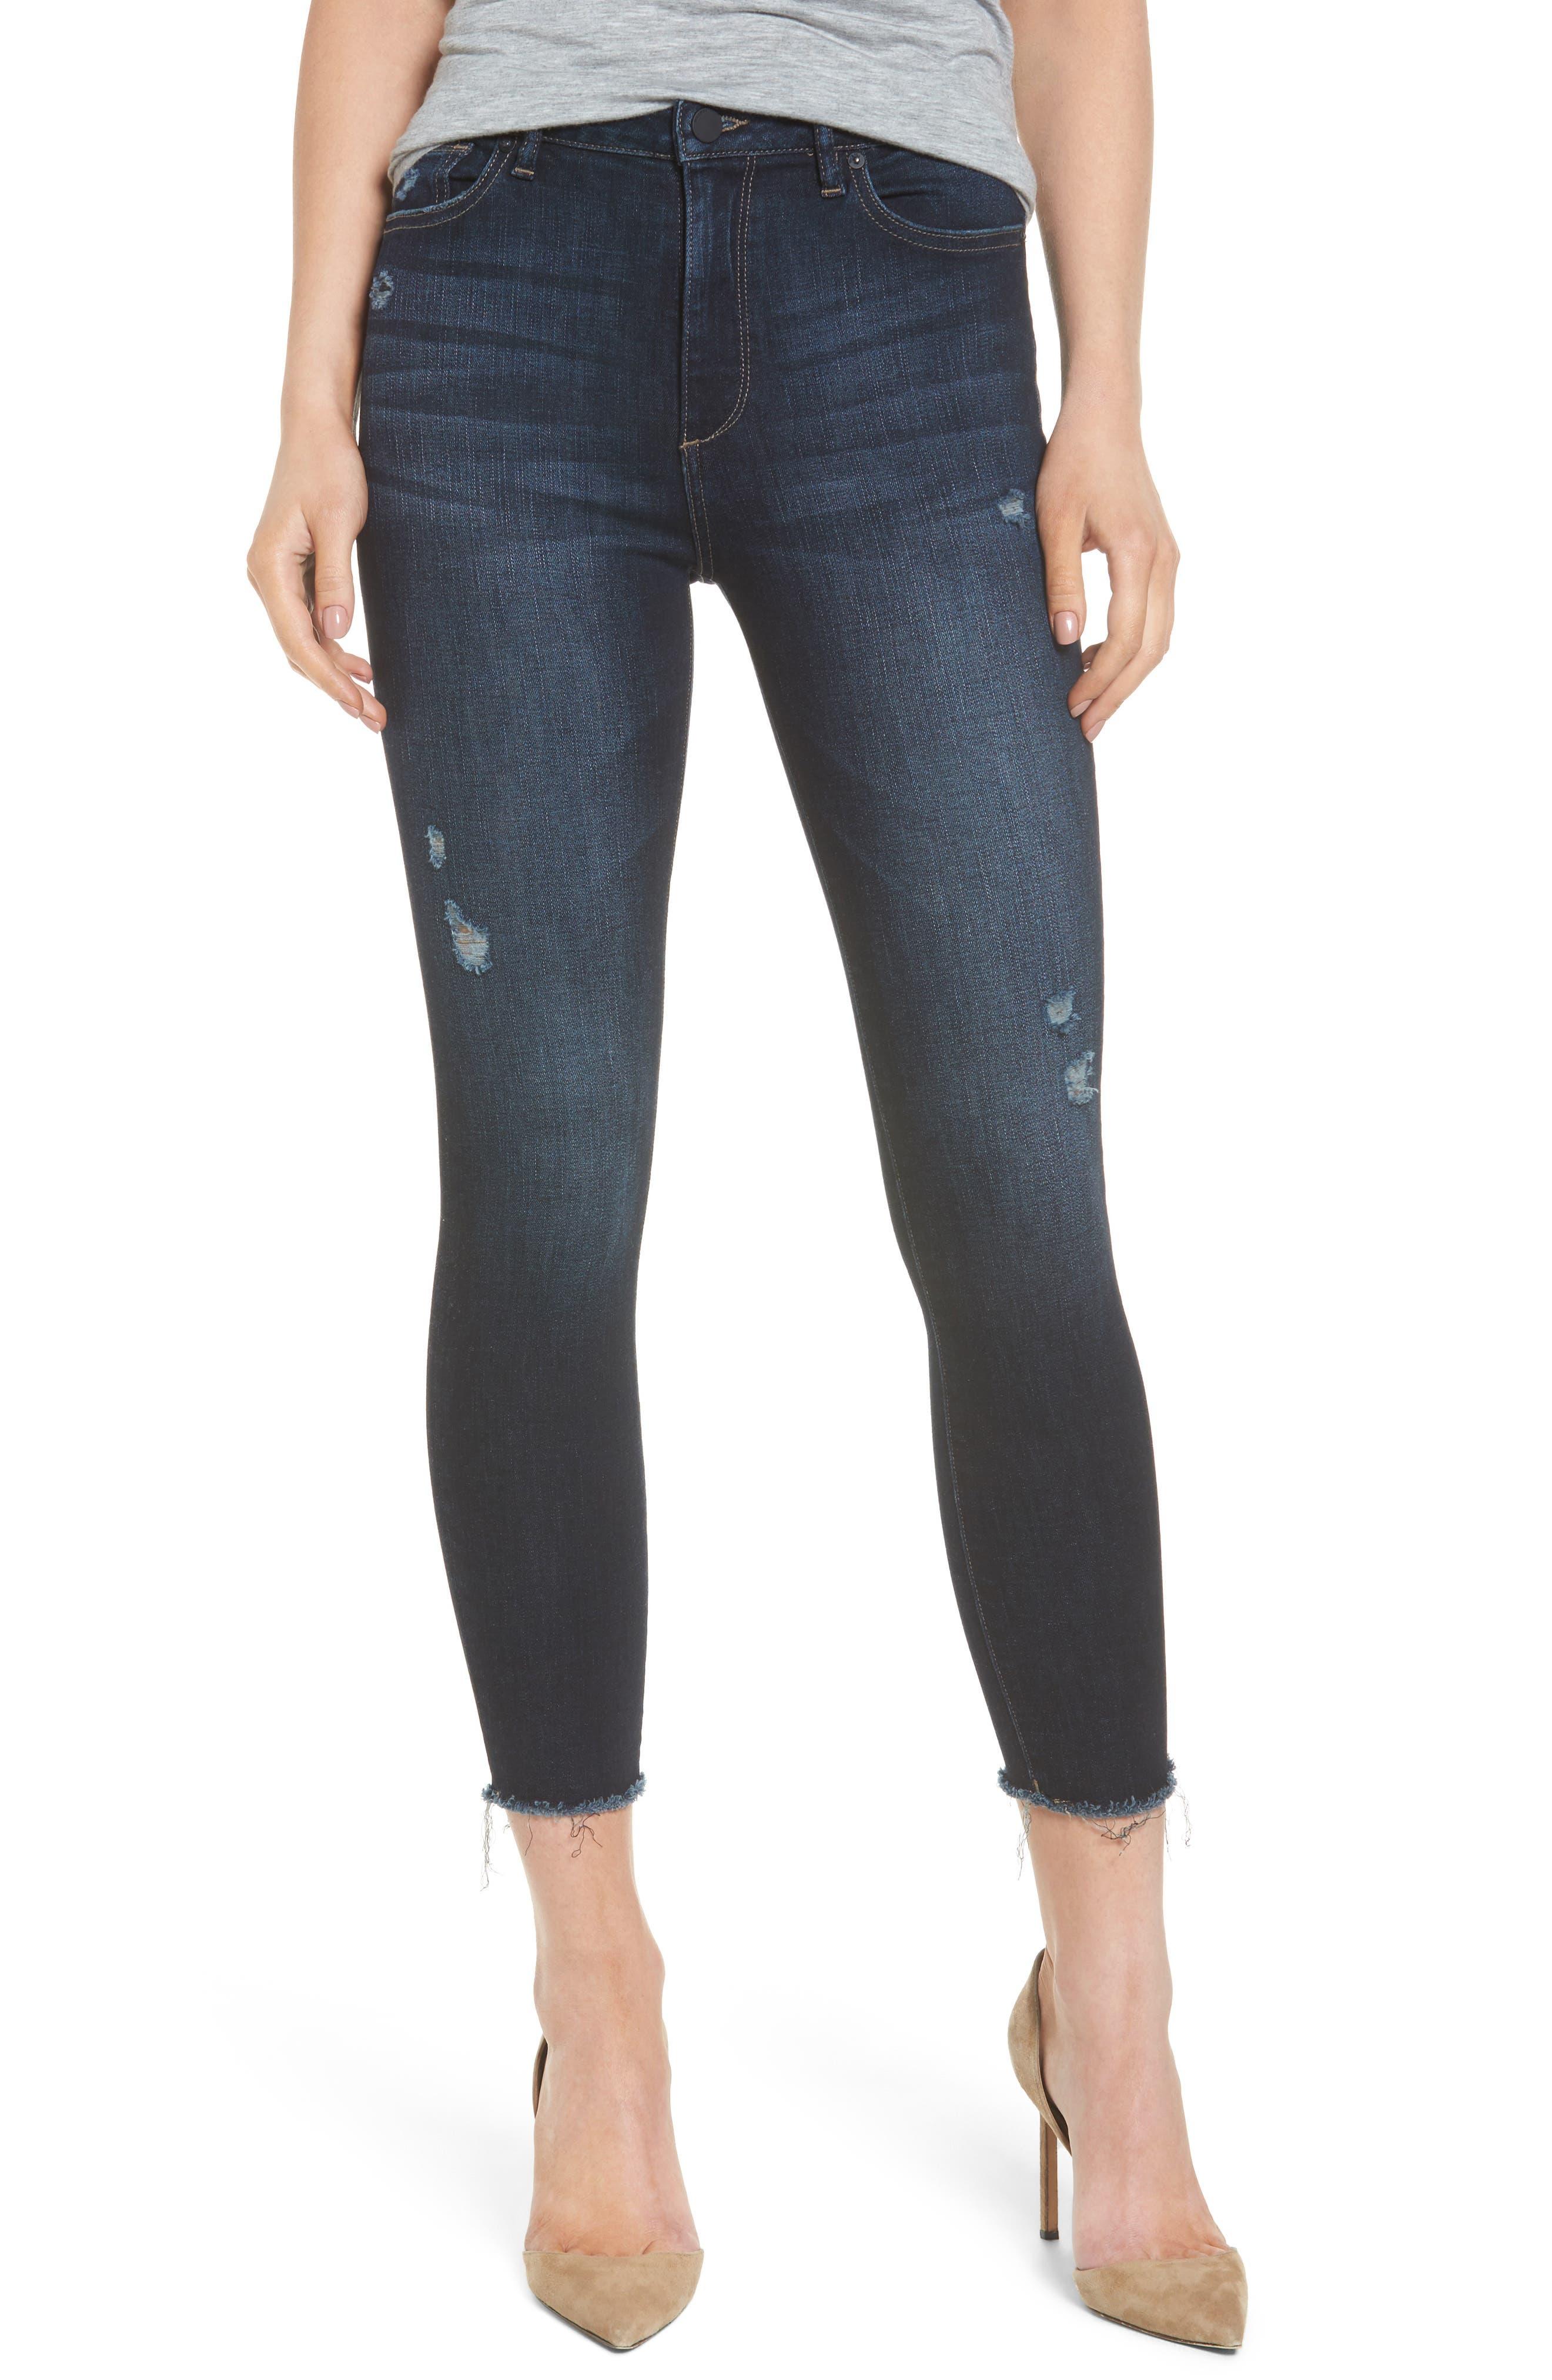 DL1961 Chrissy High Waist Crop Skinny Jeans (Trinity)